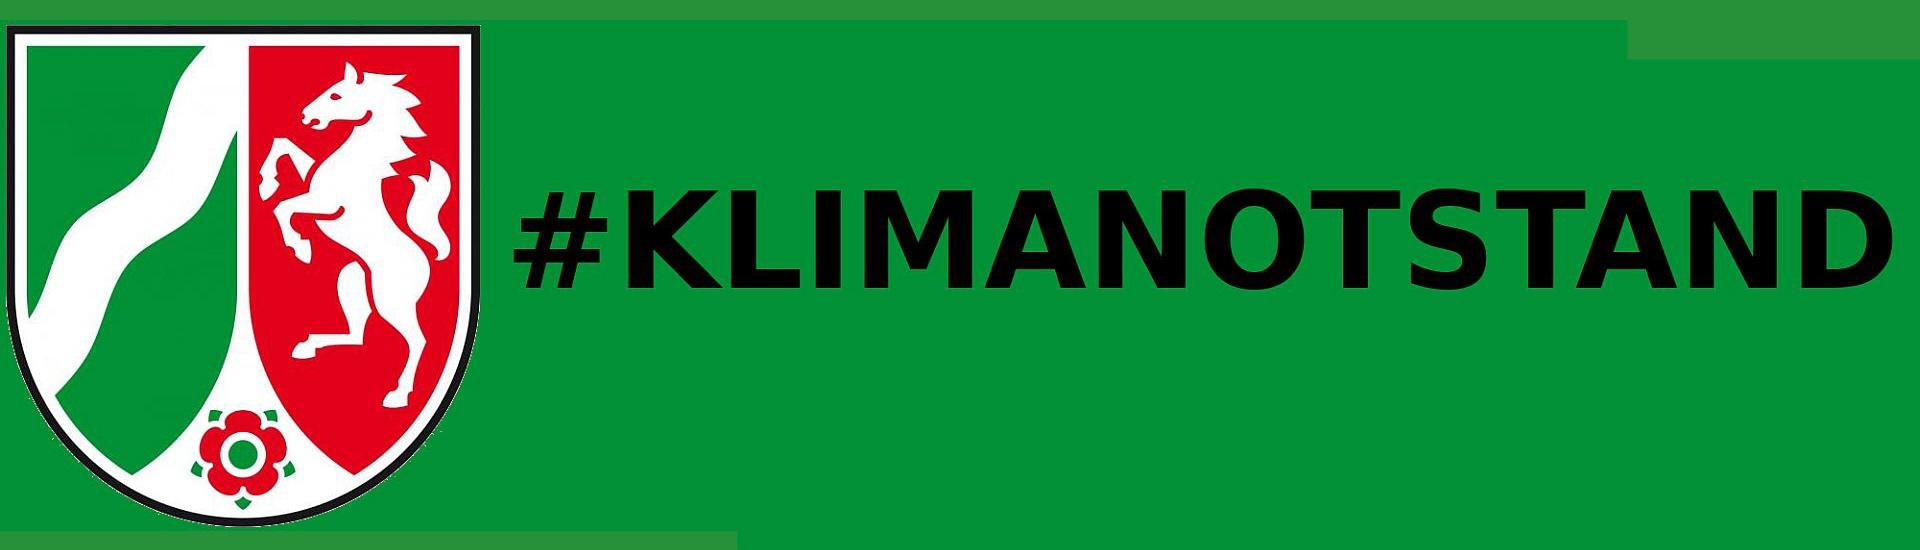 Logo Klimanotstand NRW 2000x532